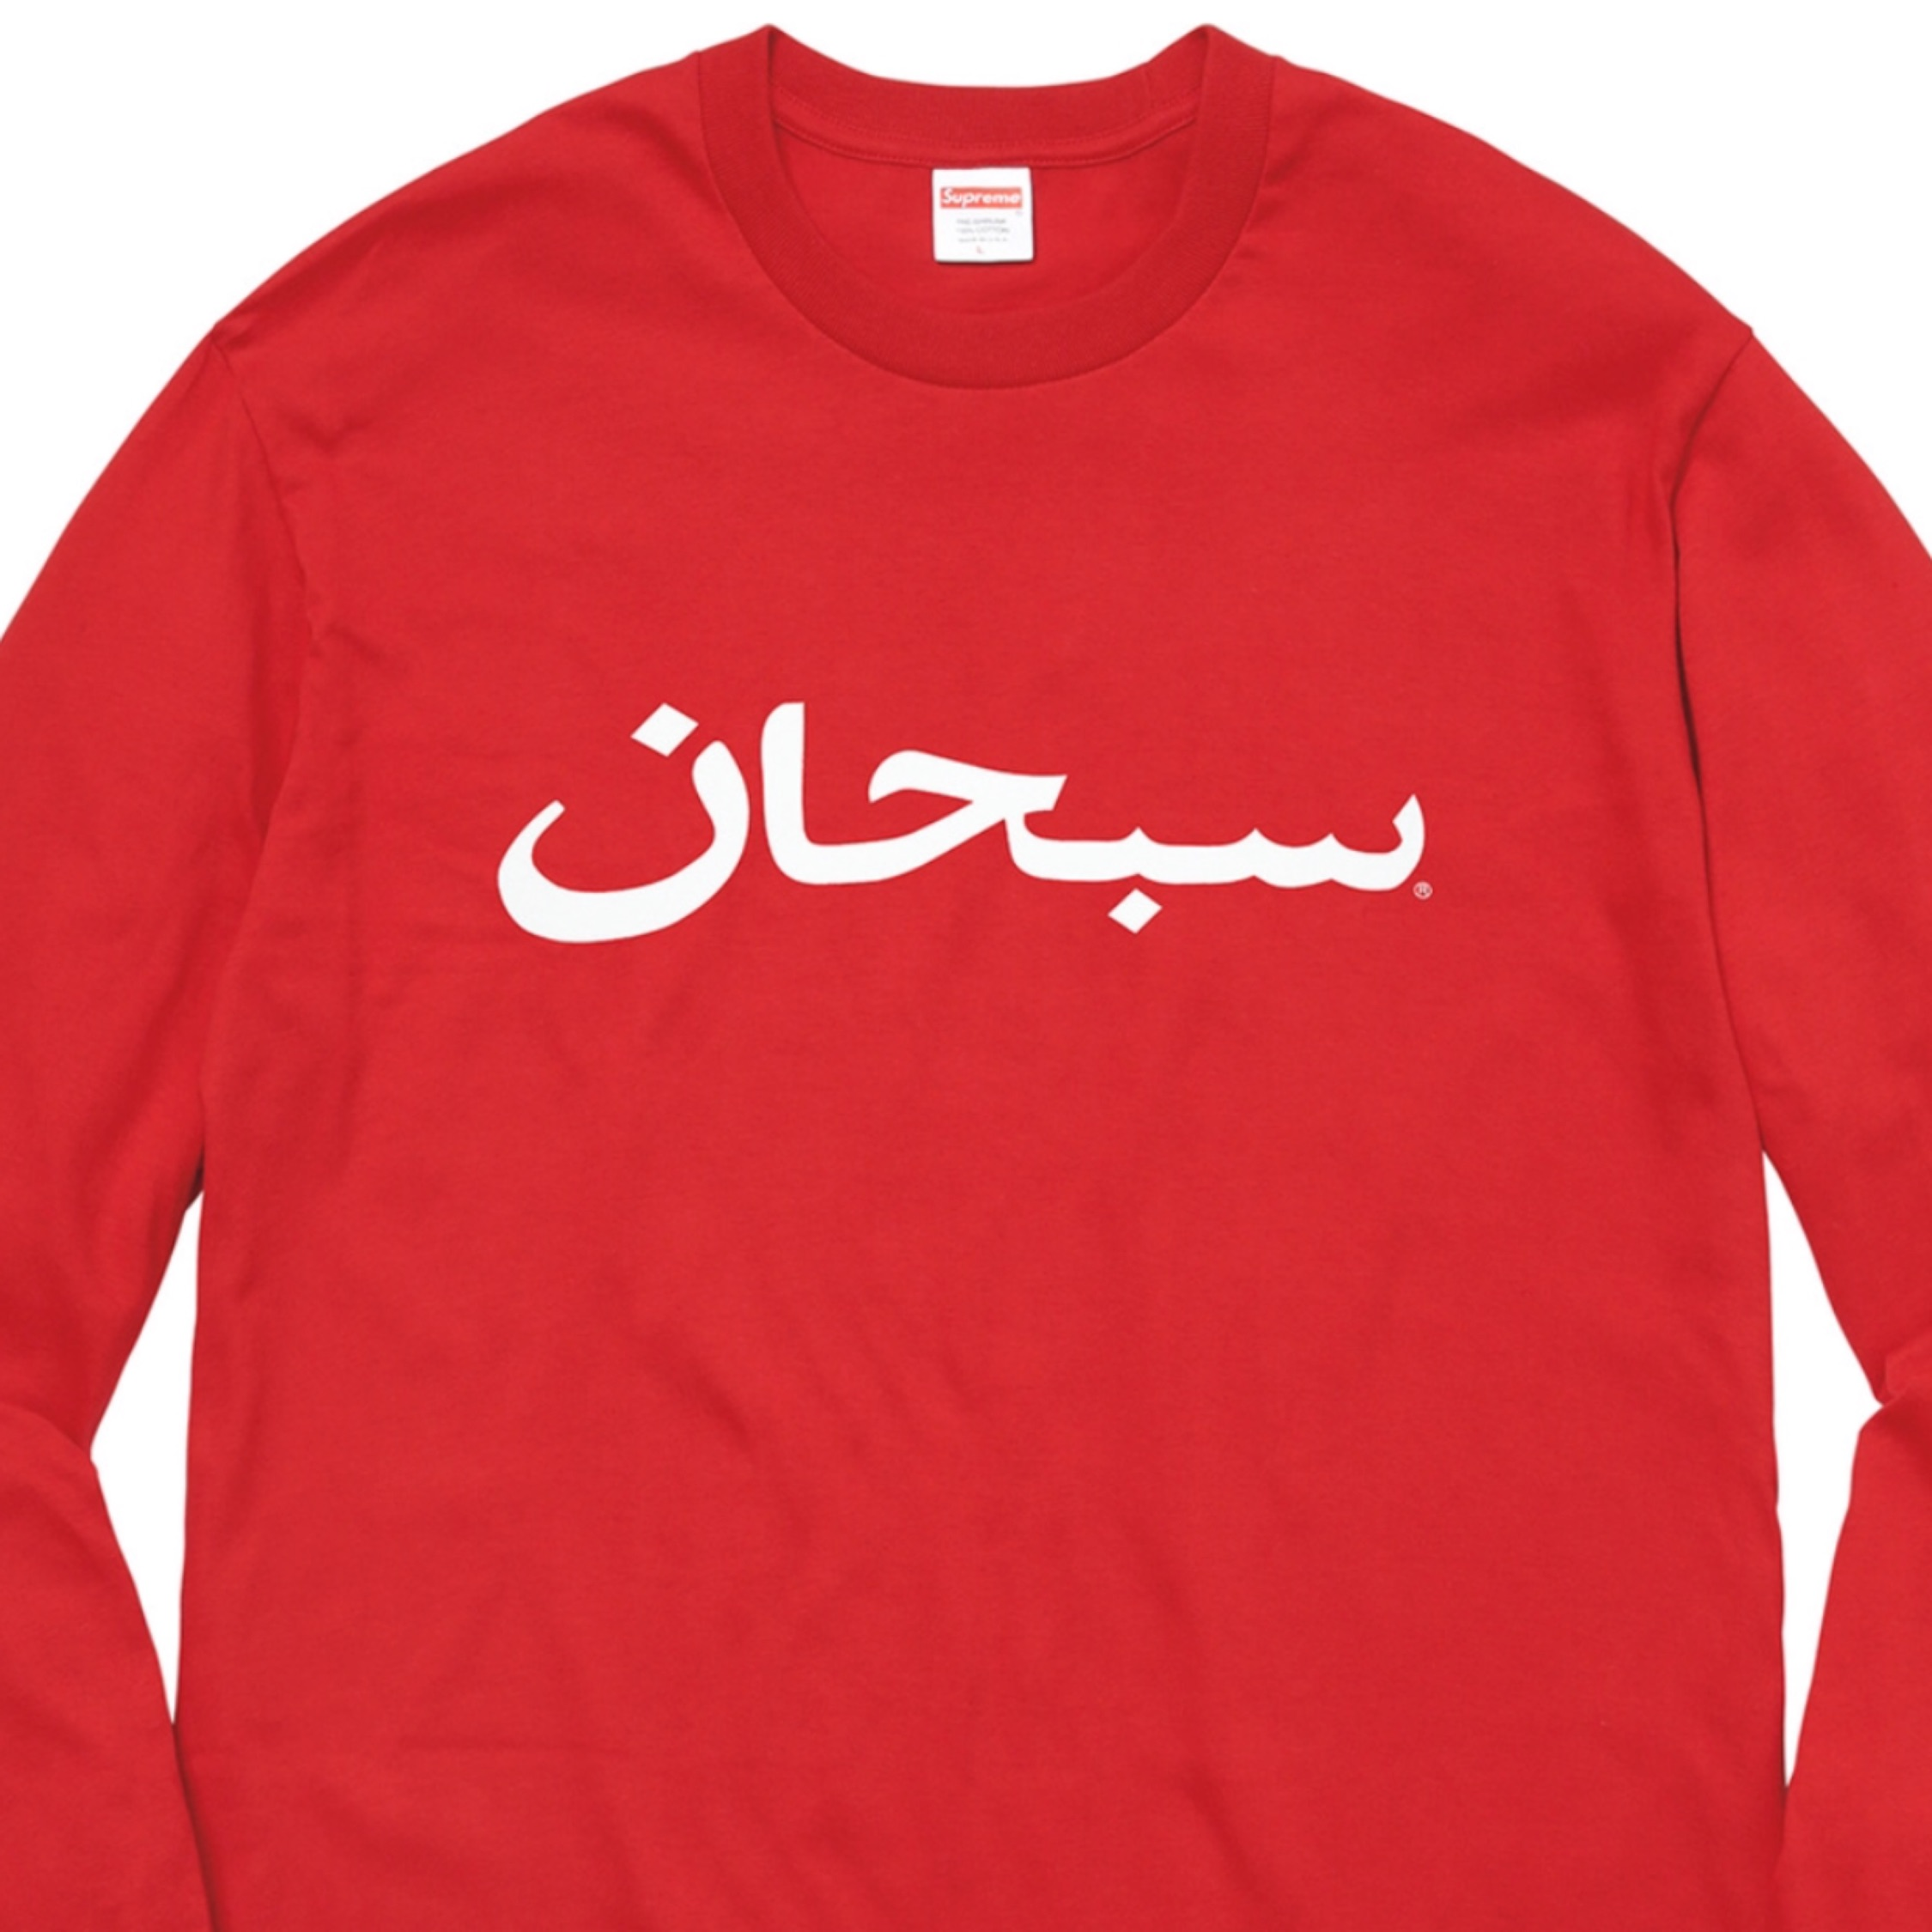 Supreme Arabic Logo Tee.